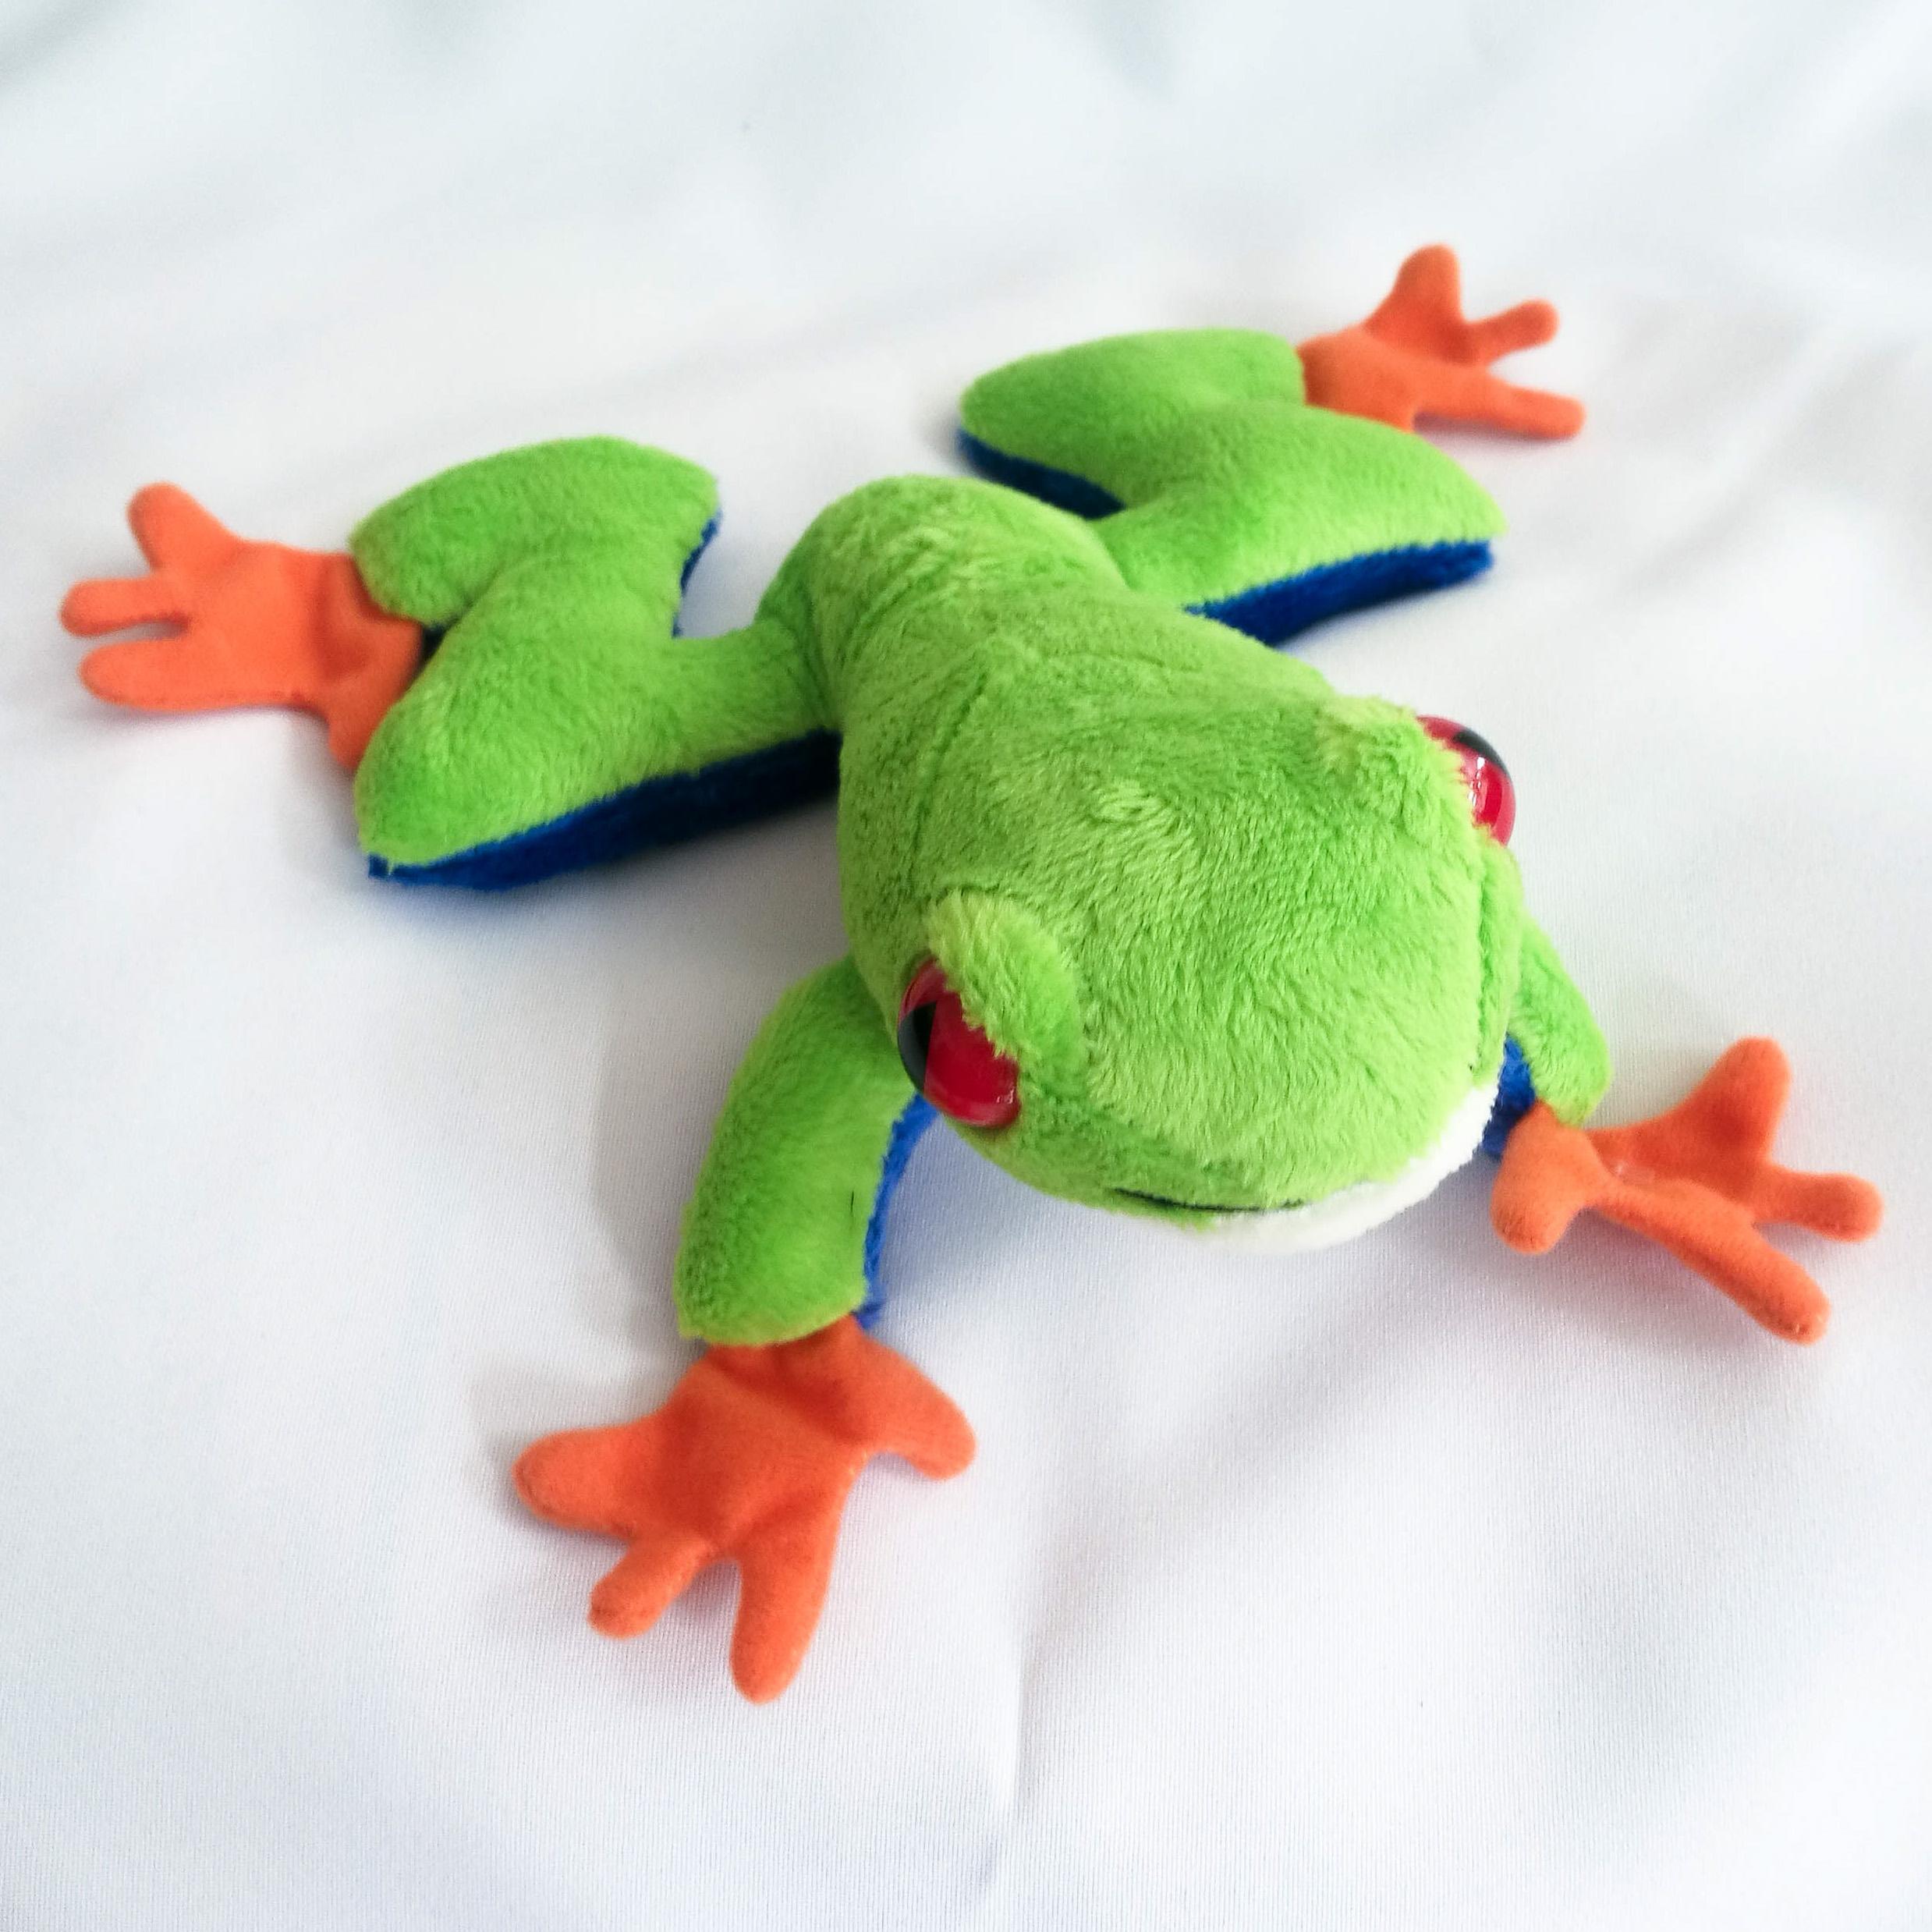 Plüschtier Frosch